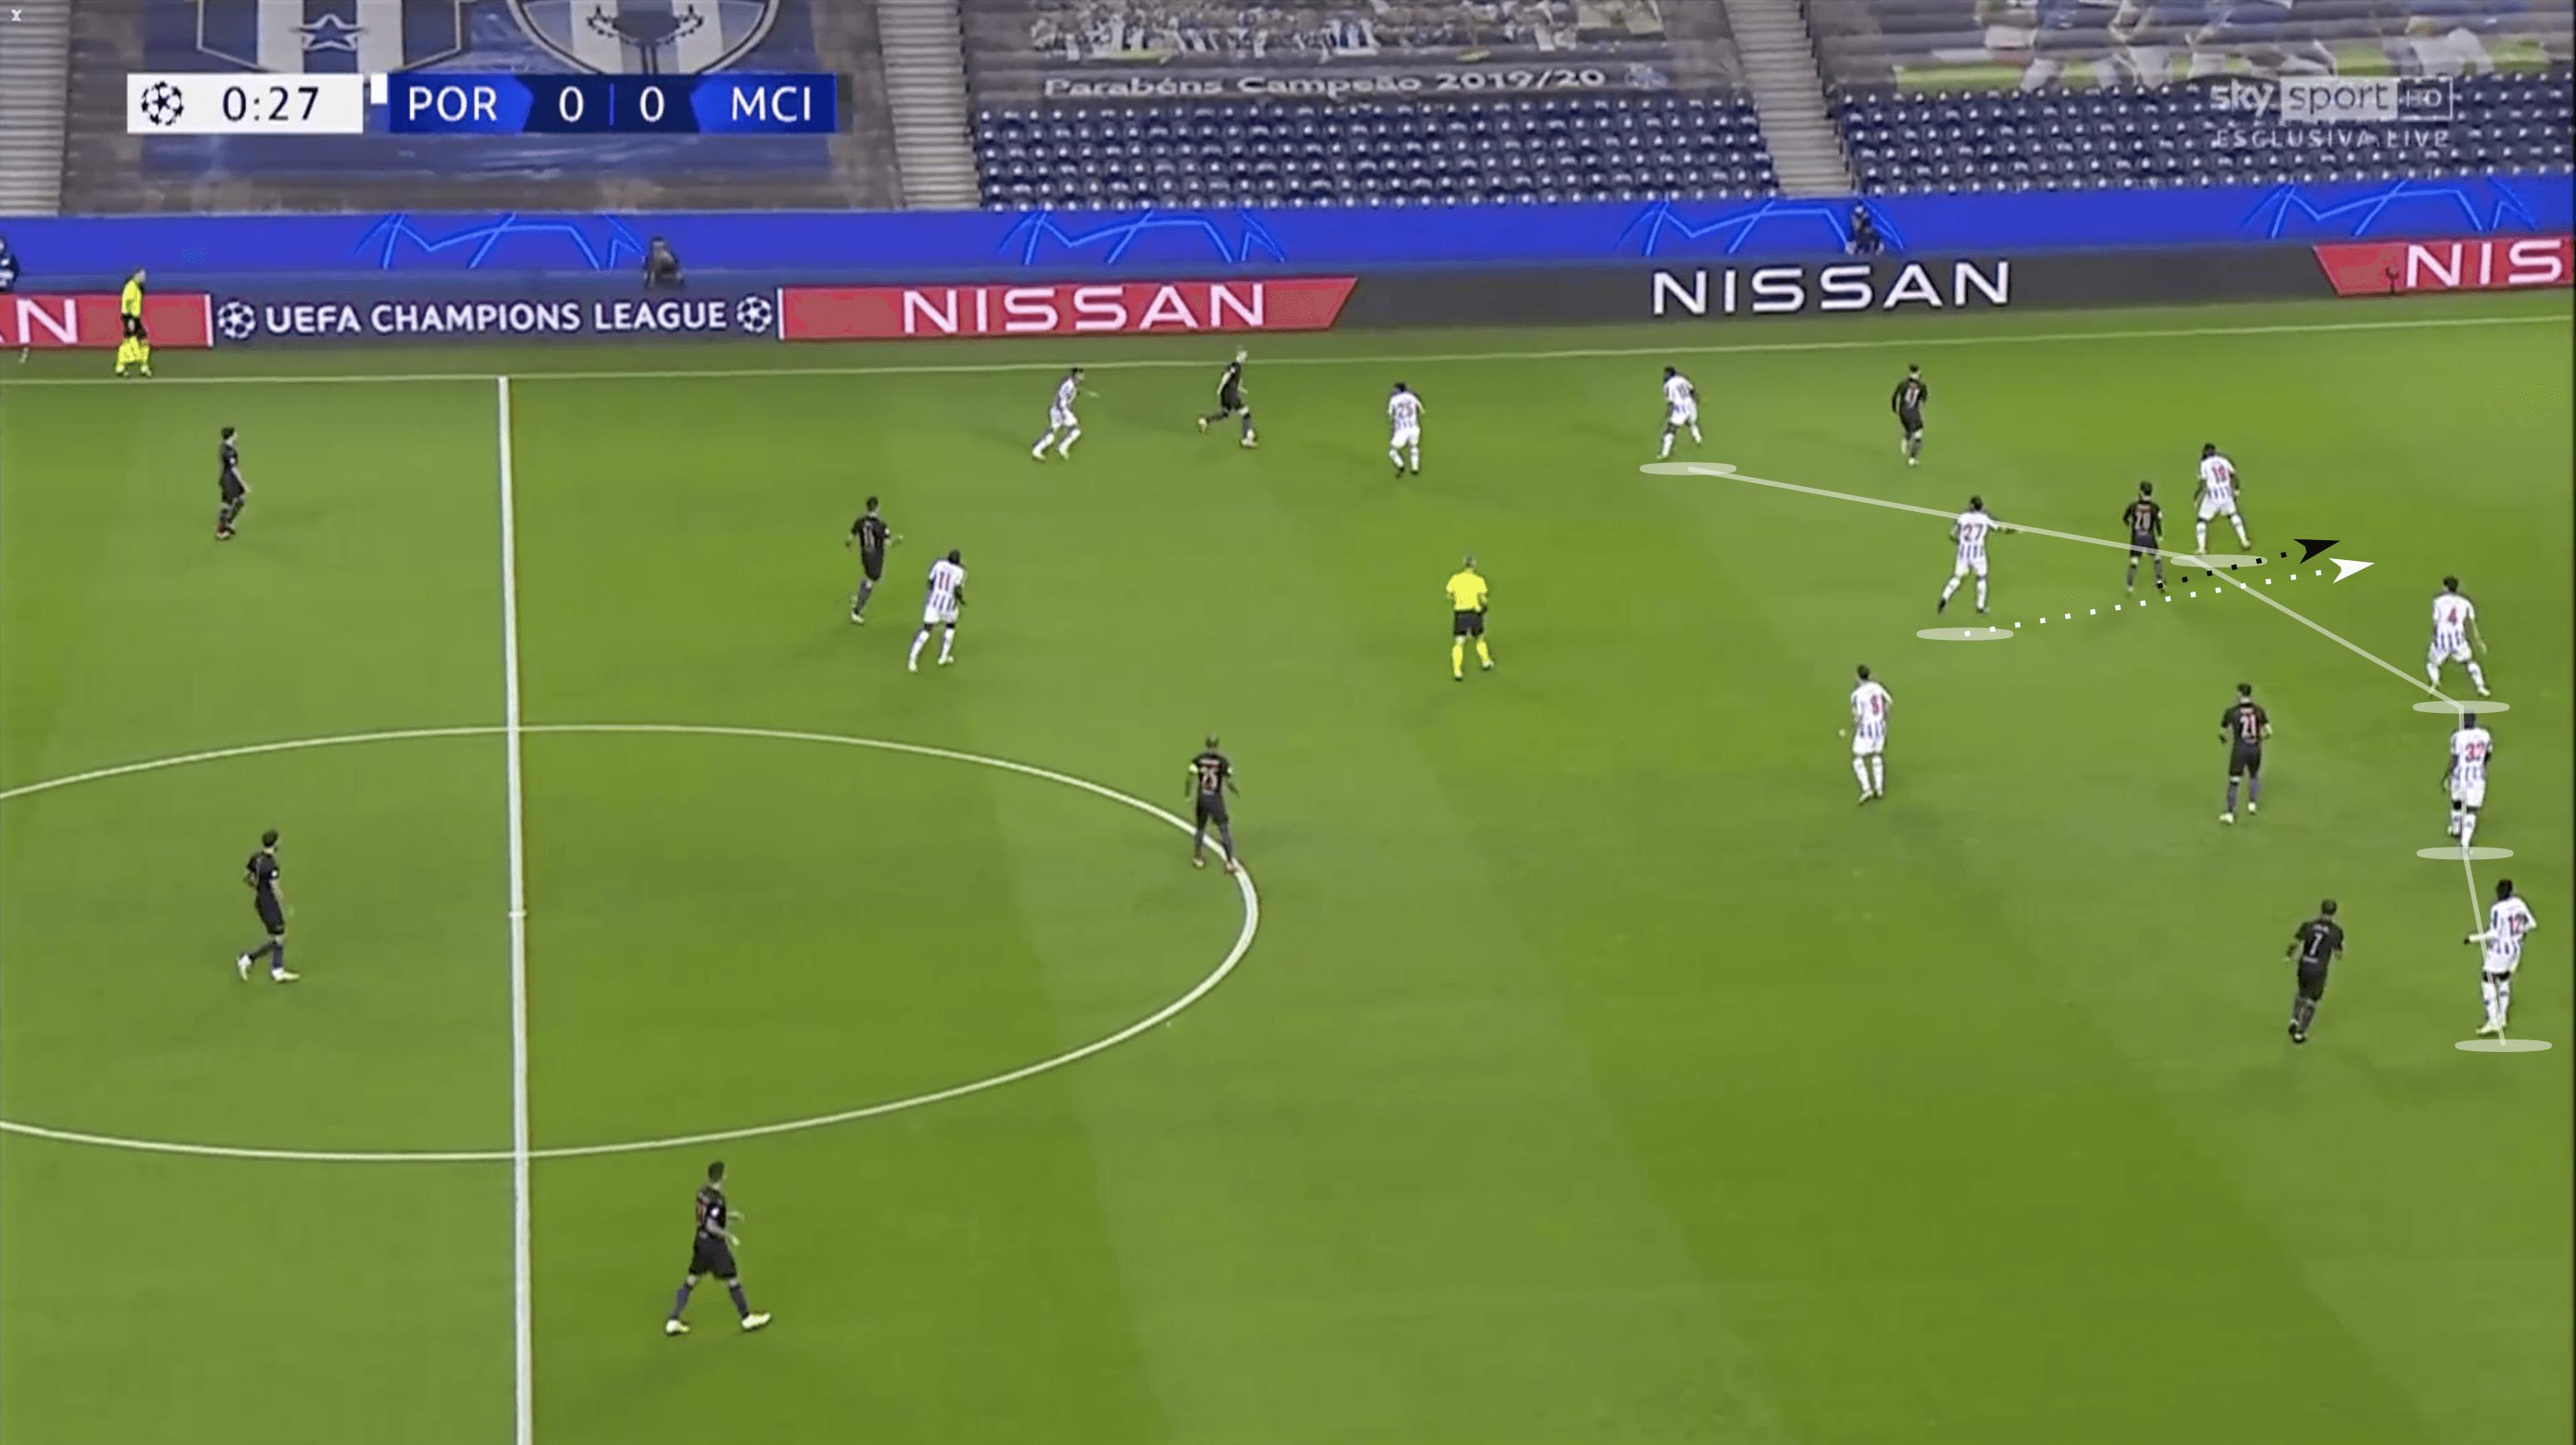 UEFA Champions League 2020/21: Porto vs Manchester City - tactical analysis tactics